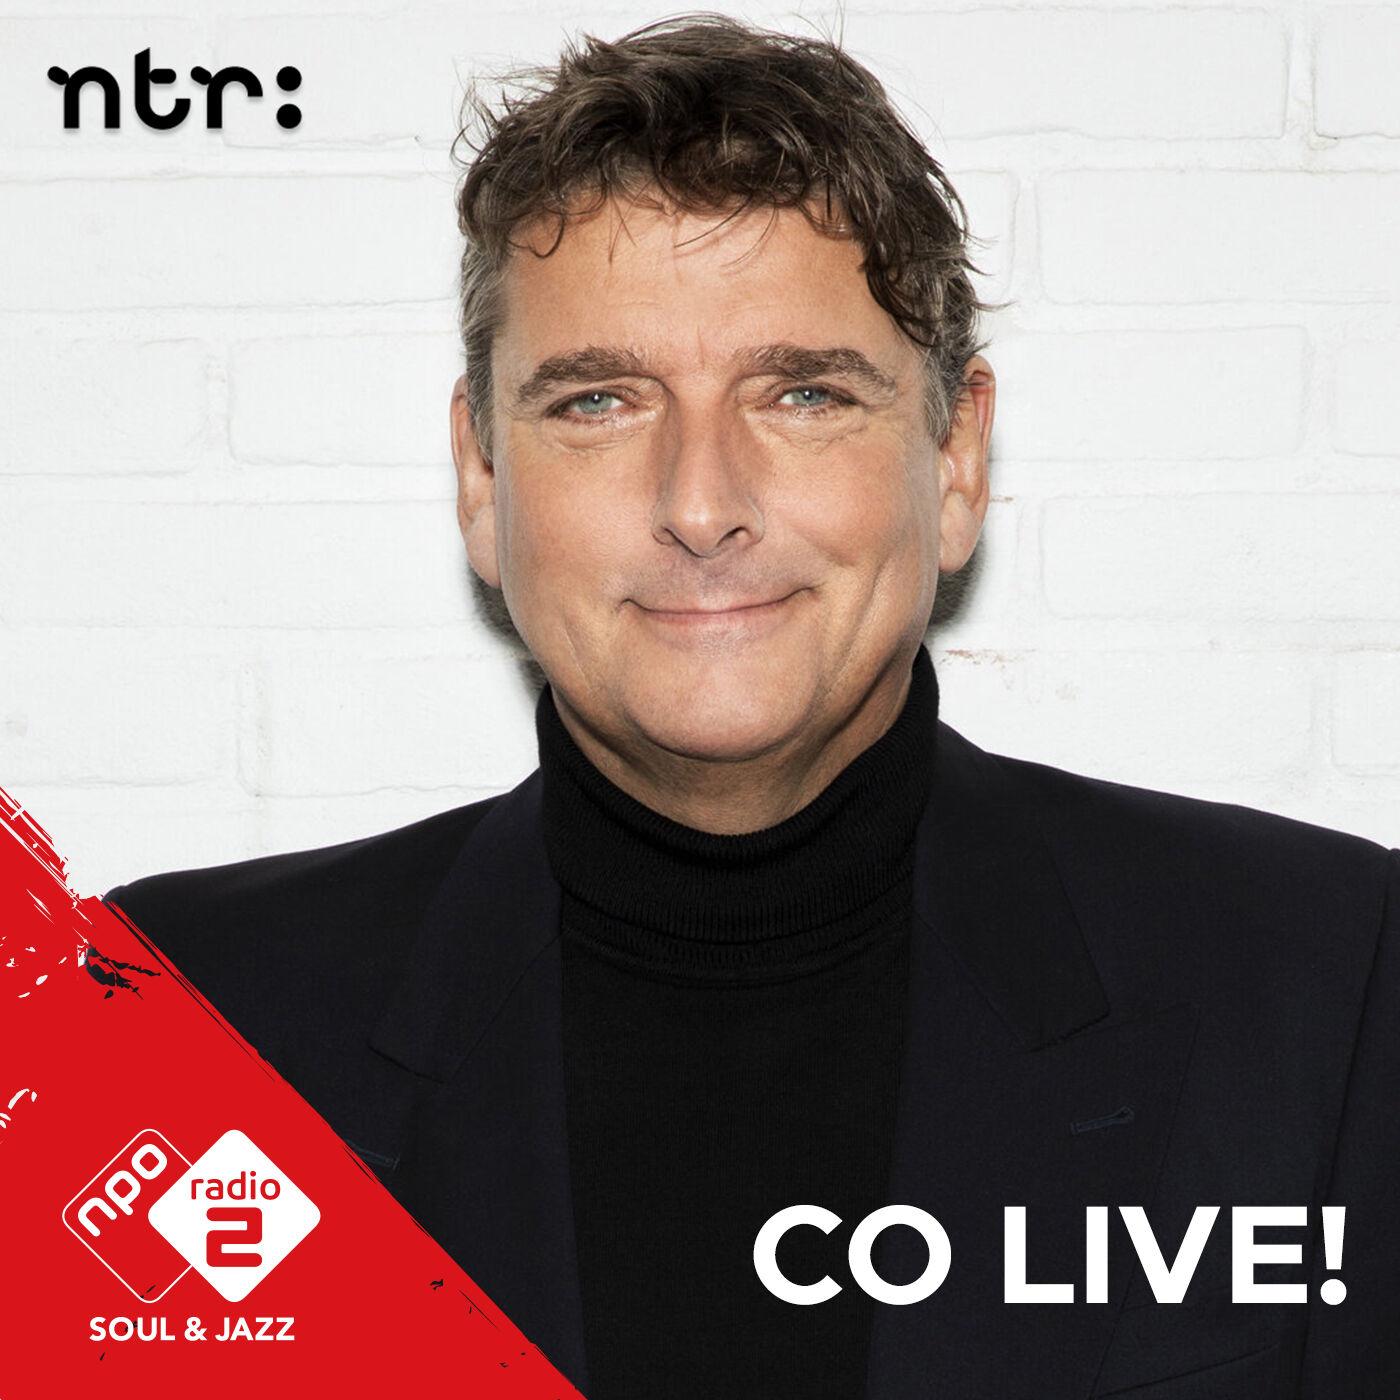 Co Live! logo